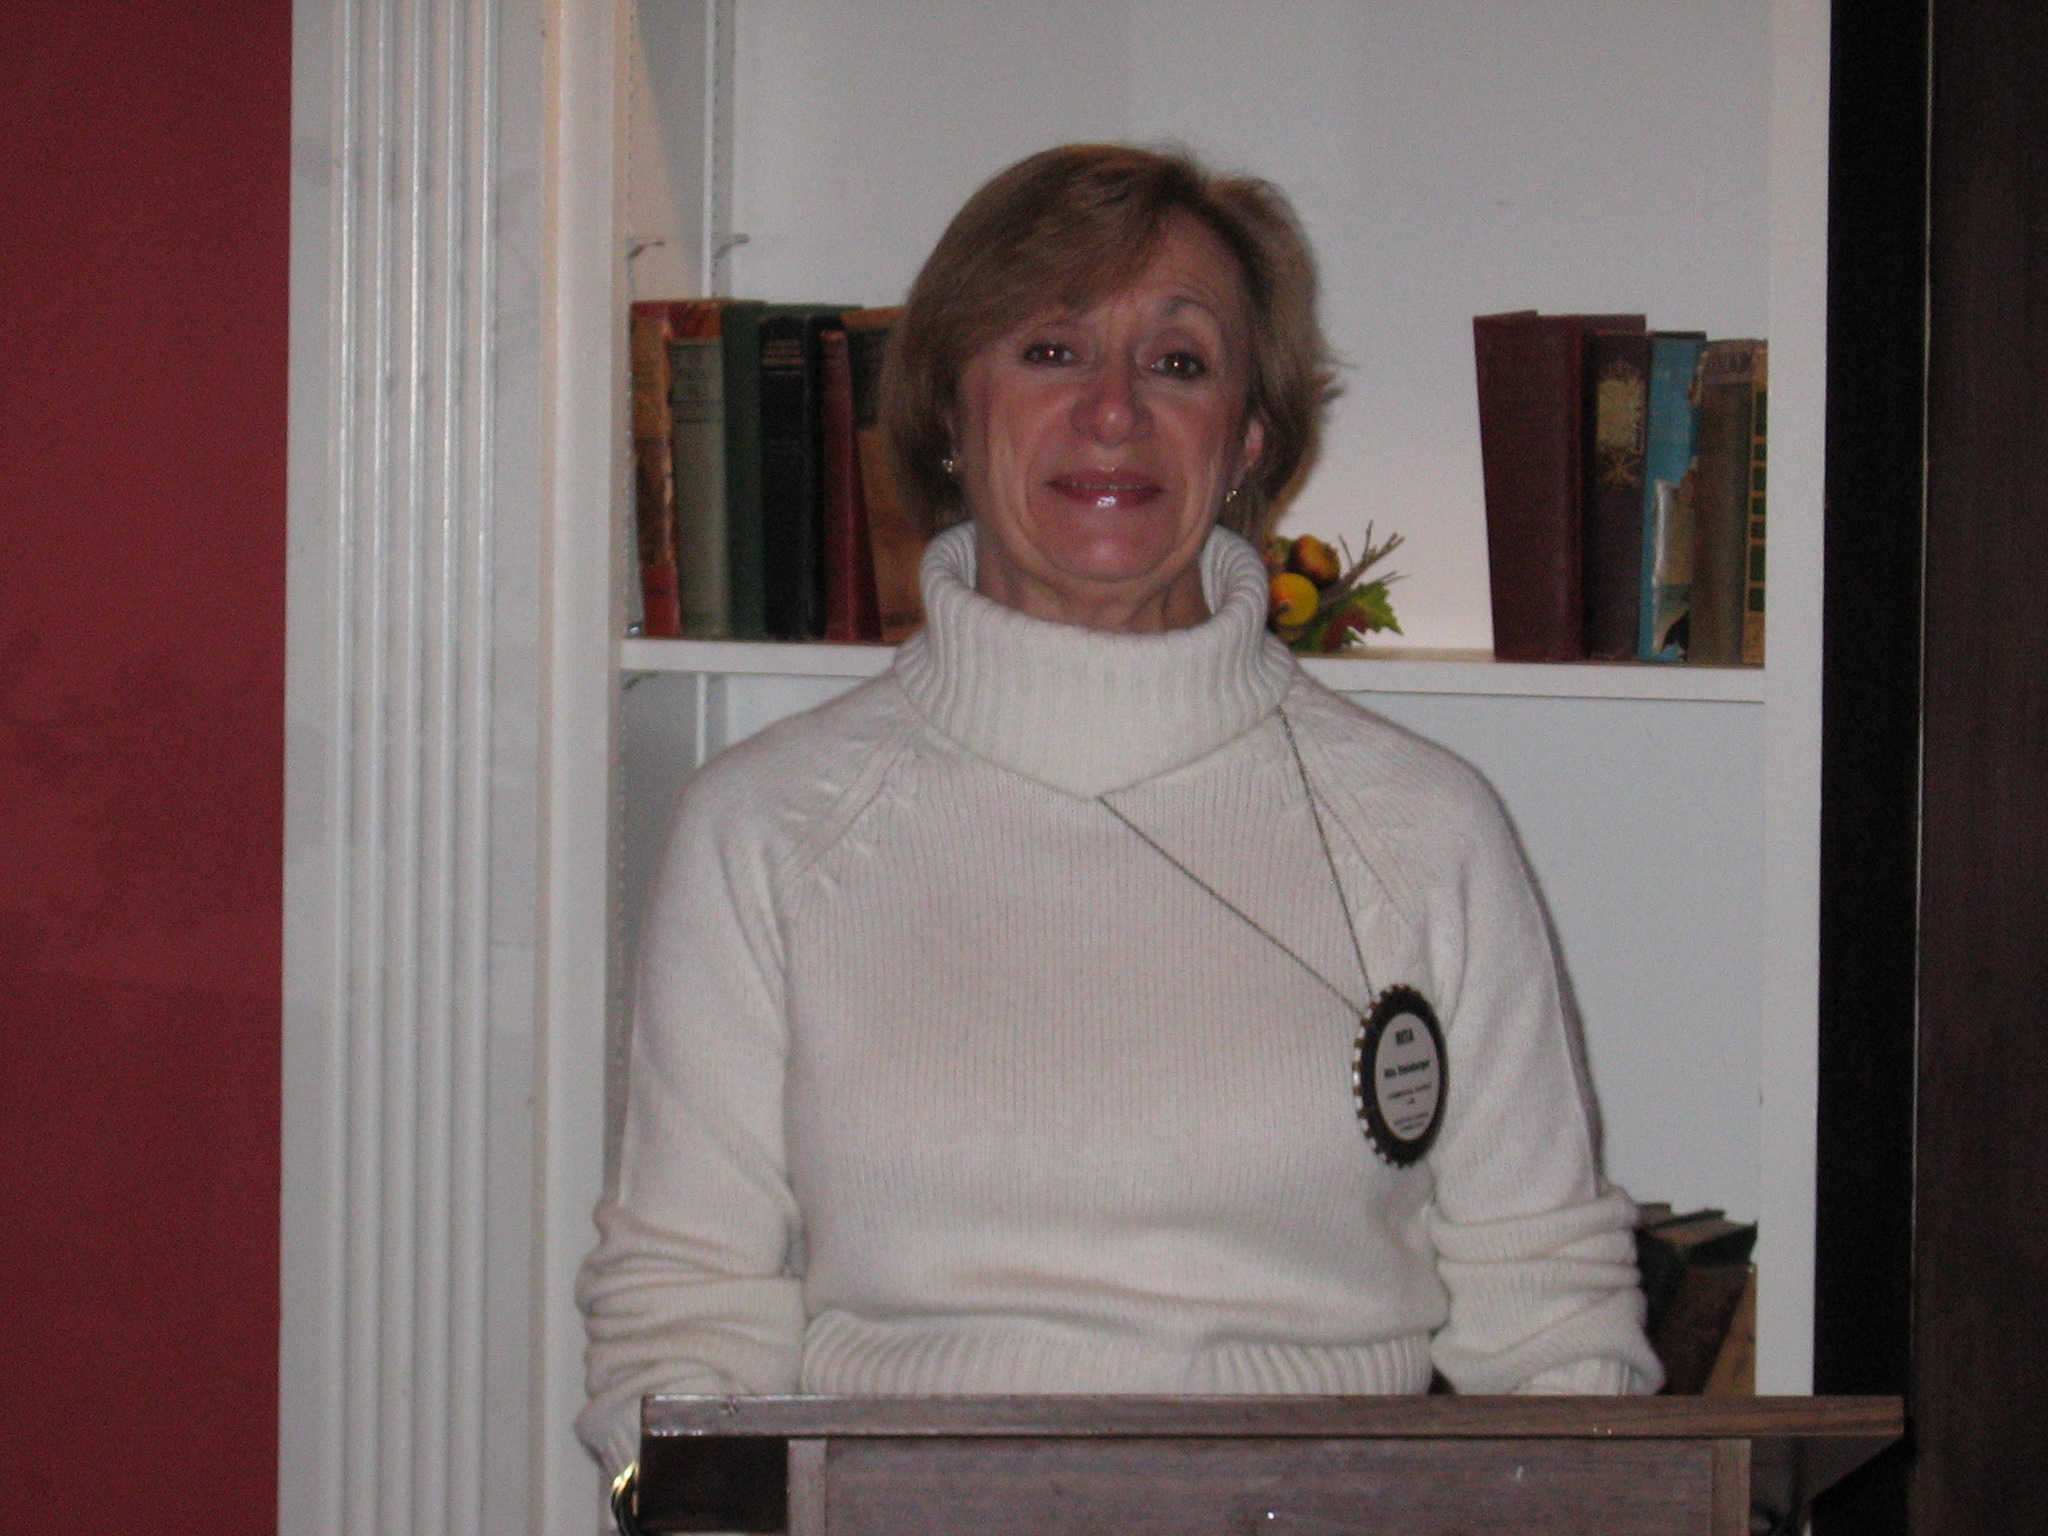 2005-11-11-Steiberger.jpg